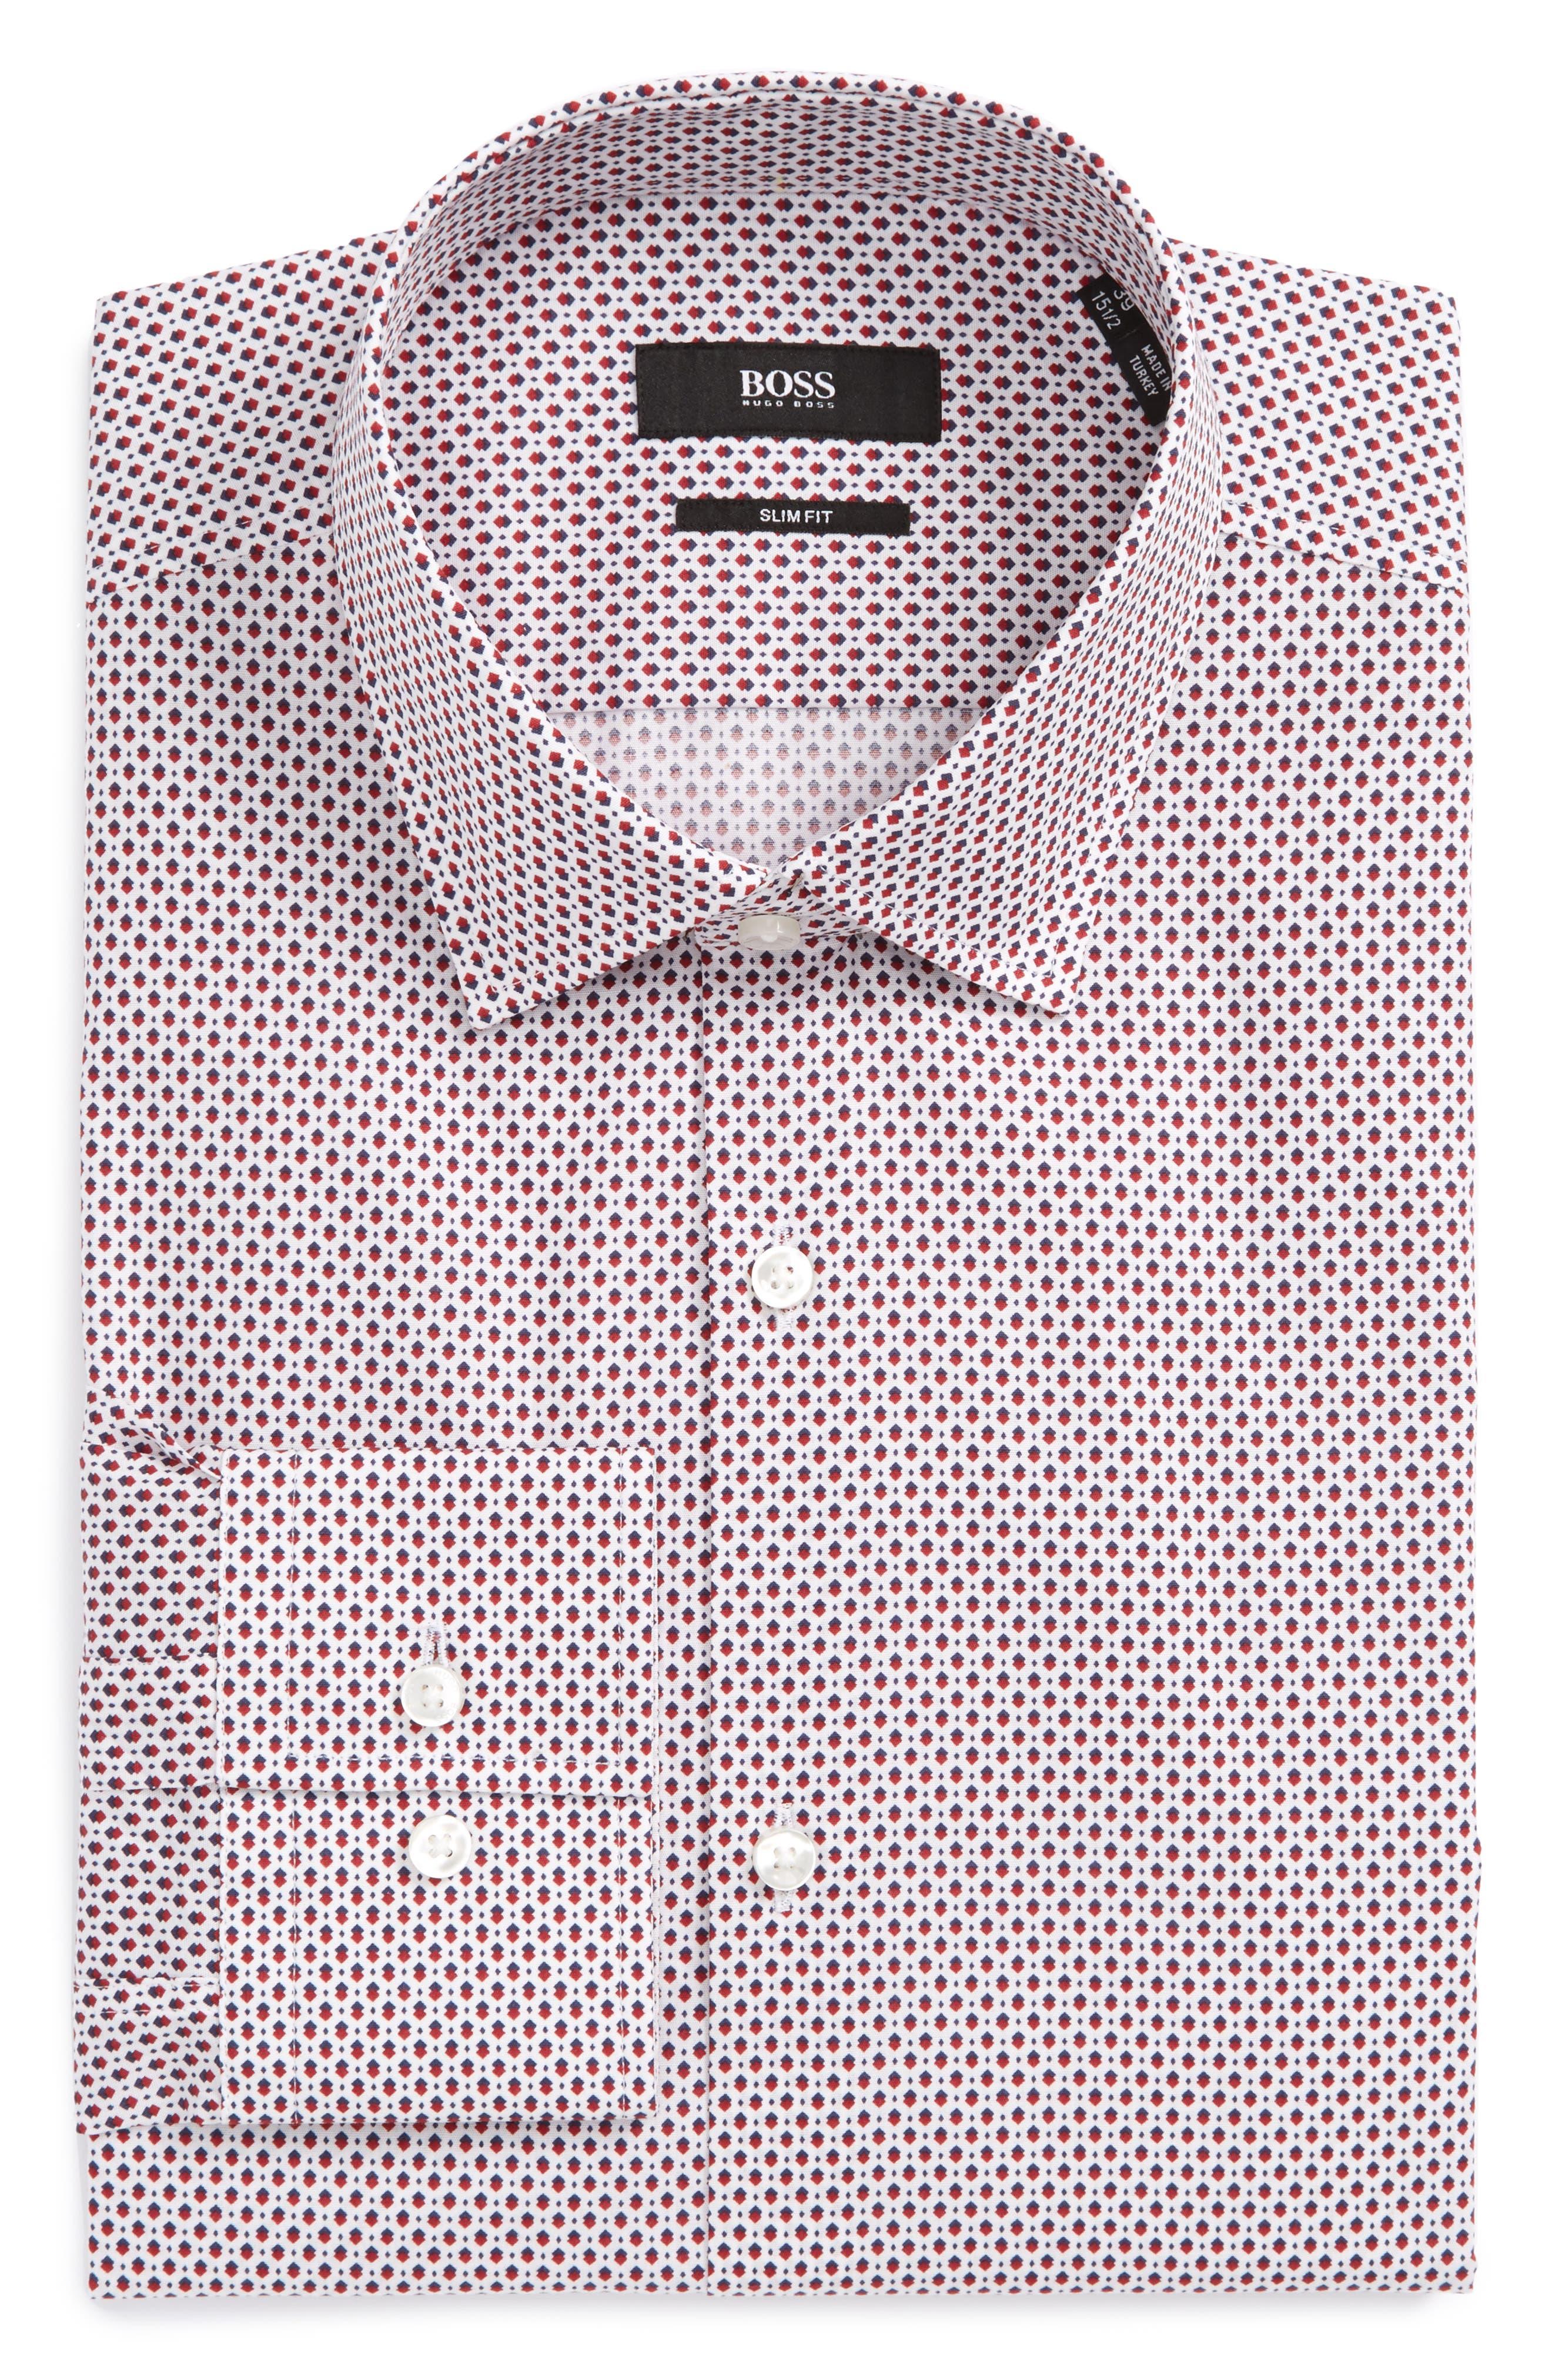 Jenno Slim Fit Print Dress Shirt,                             Main thumbnail 1, color,                             610